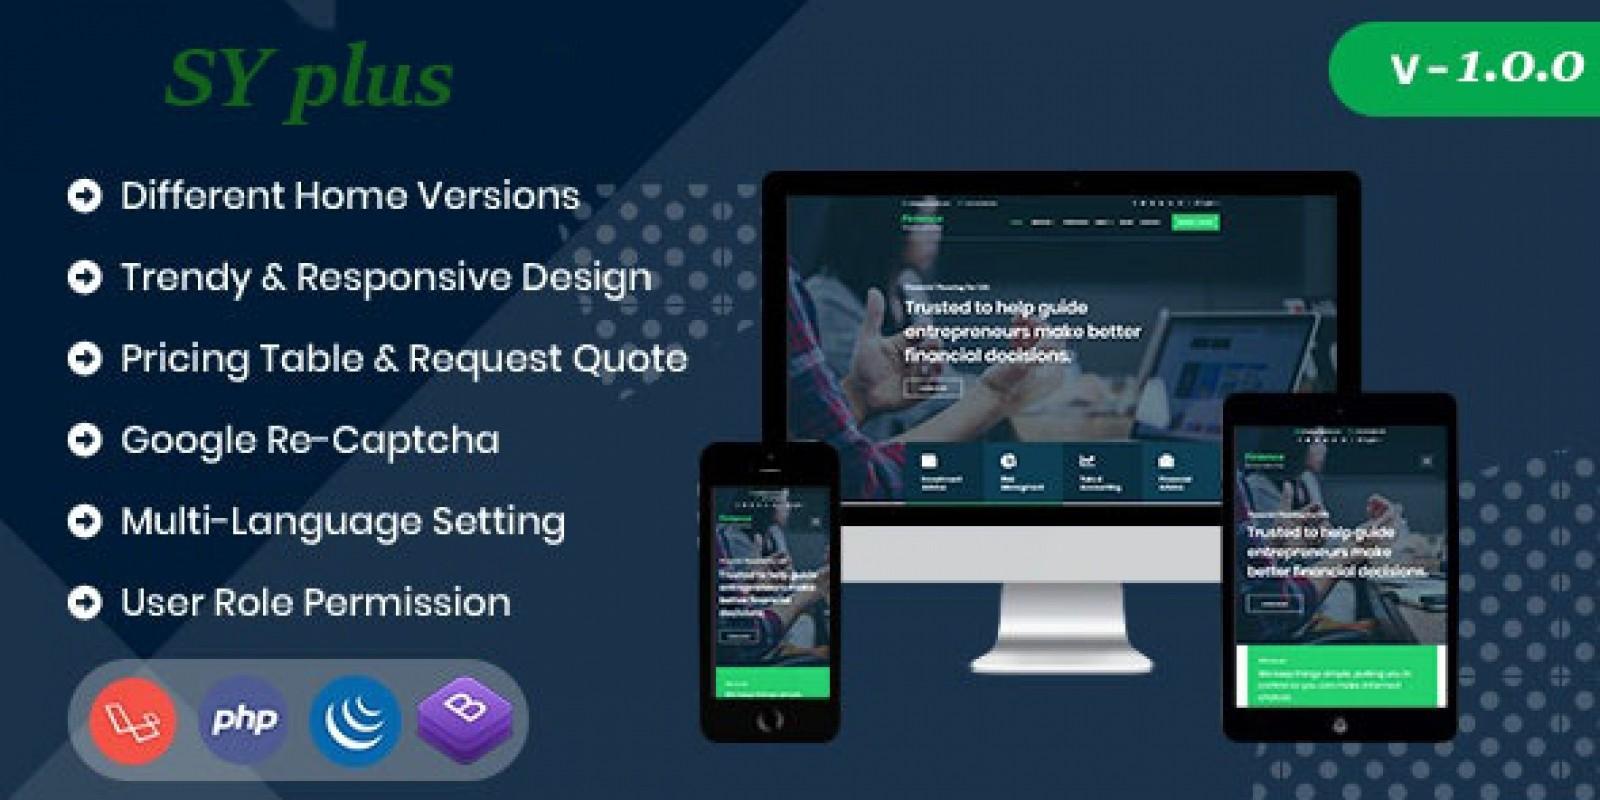 Sy Plus - Multipurpose Business Website CMS